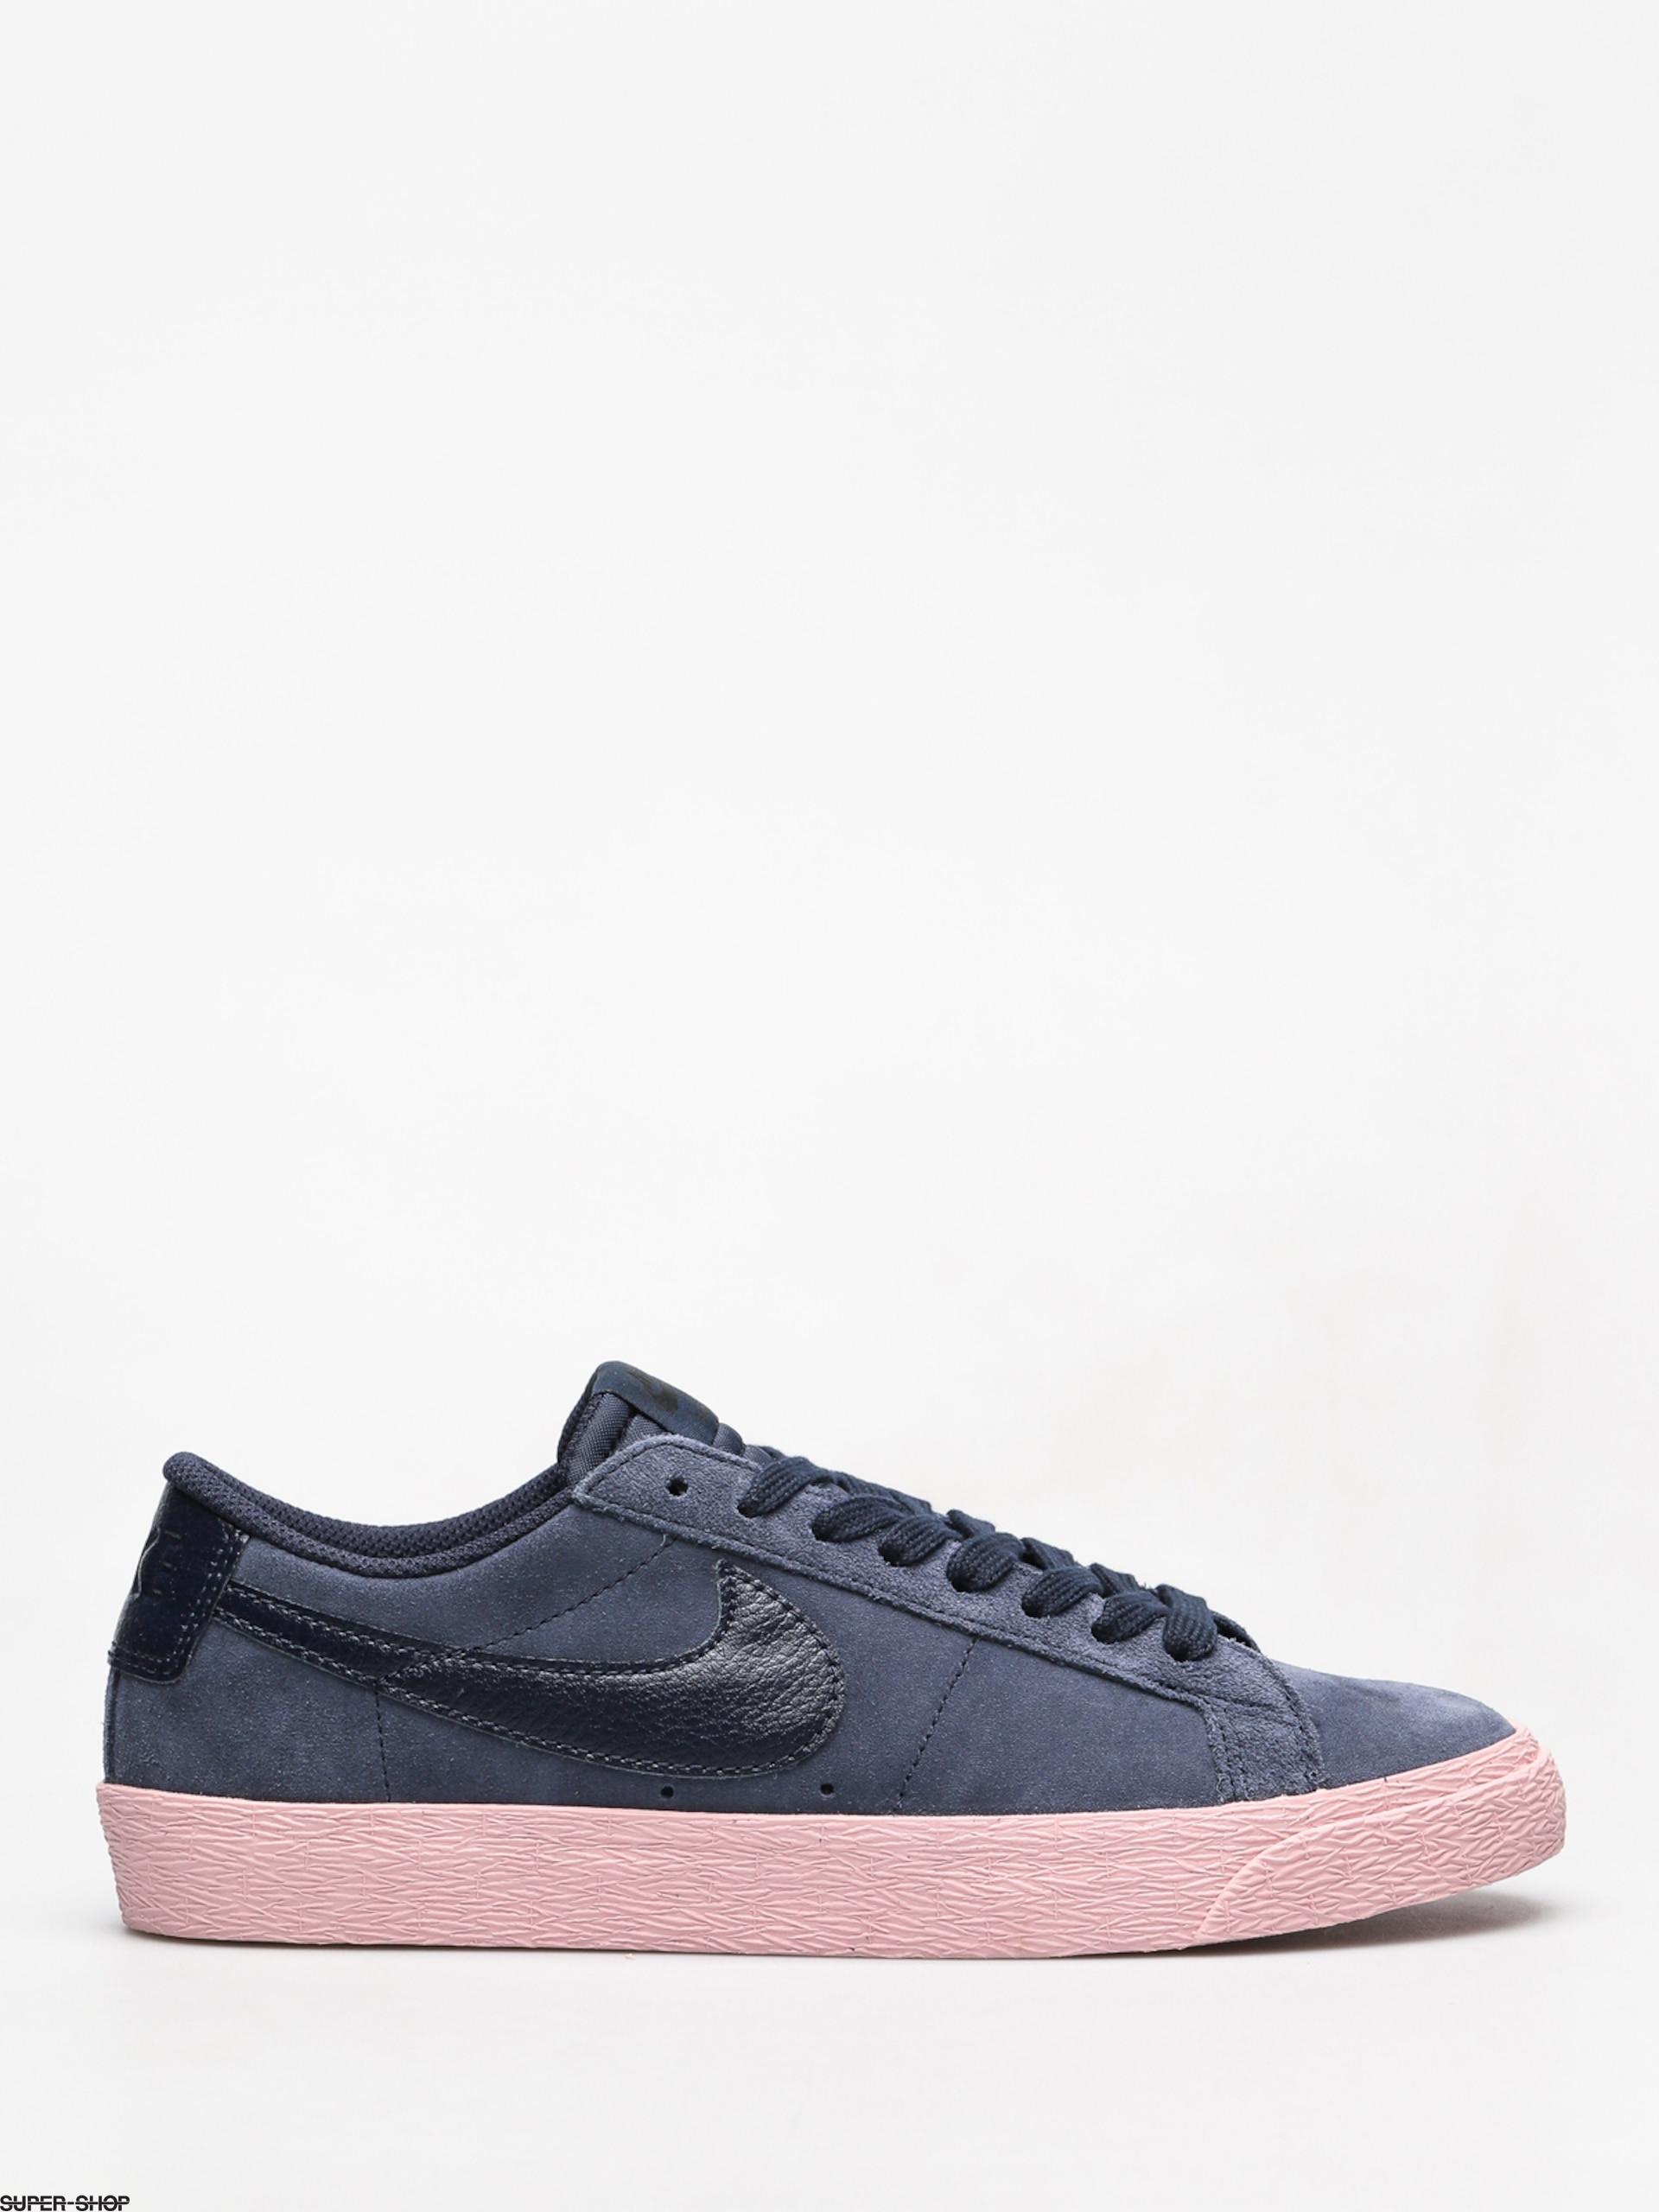 Nike SB Sb Zoom Blazer Low Shoes (obsidian obsidian bubblegum) 4664ebcc6